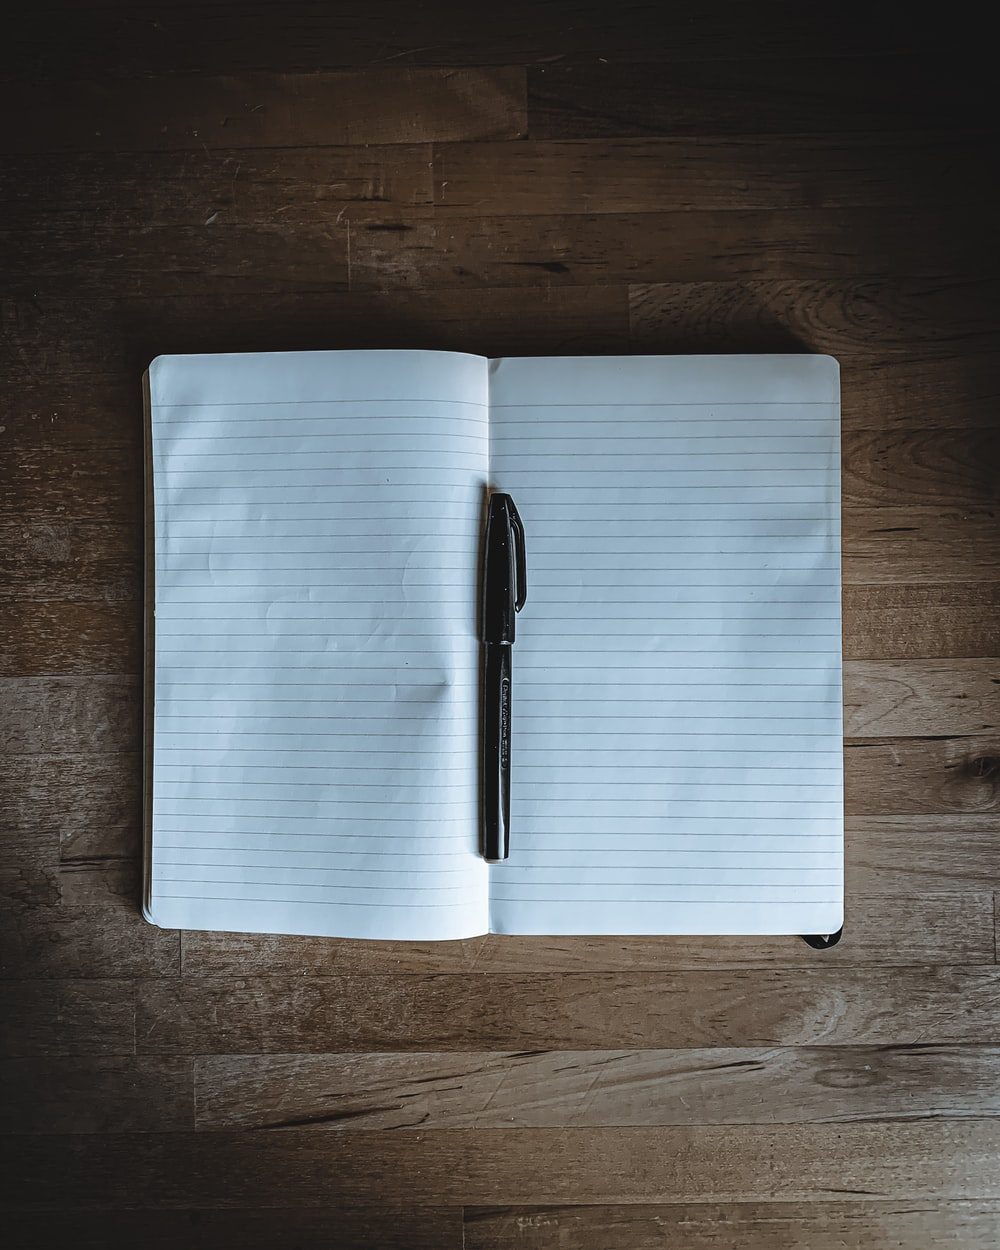 black click pen on white notebook